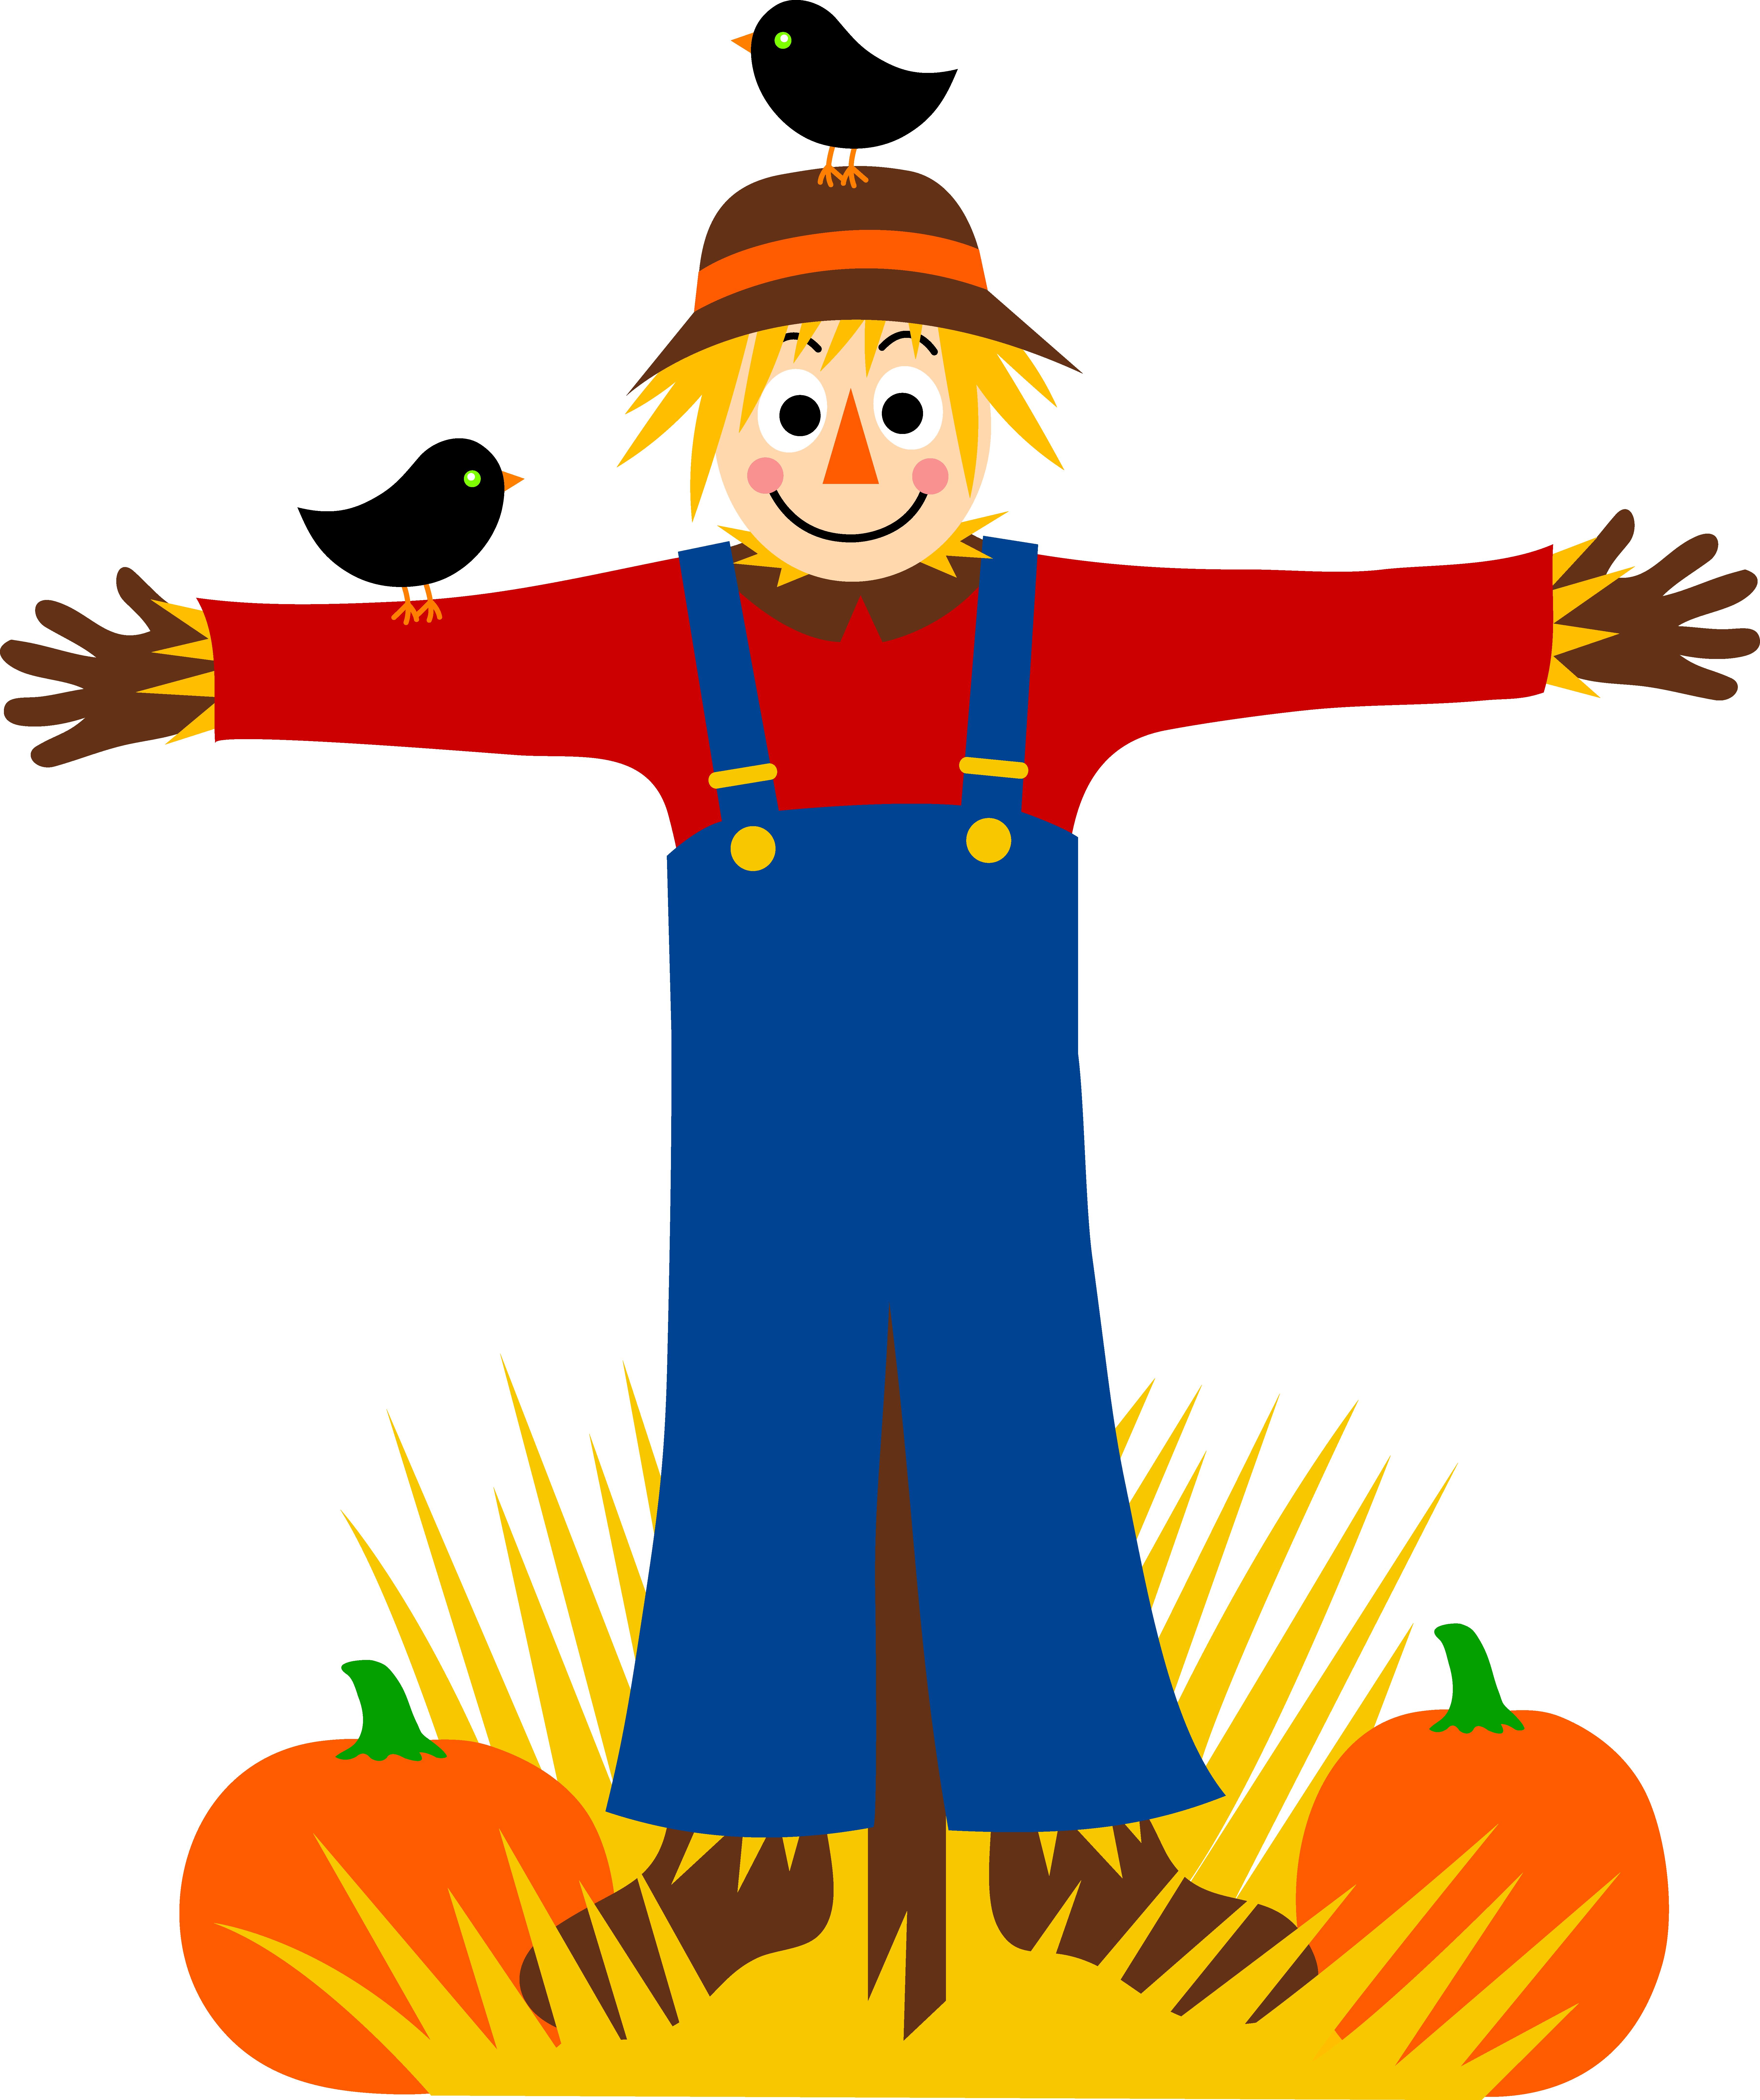 7219x8614 15 Scarecrow Vector Simple For Free Download On Mbtskoudsalg